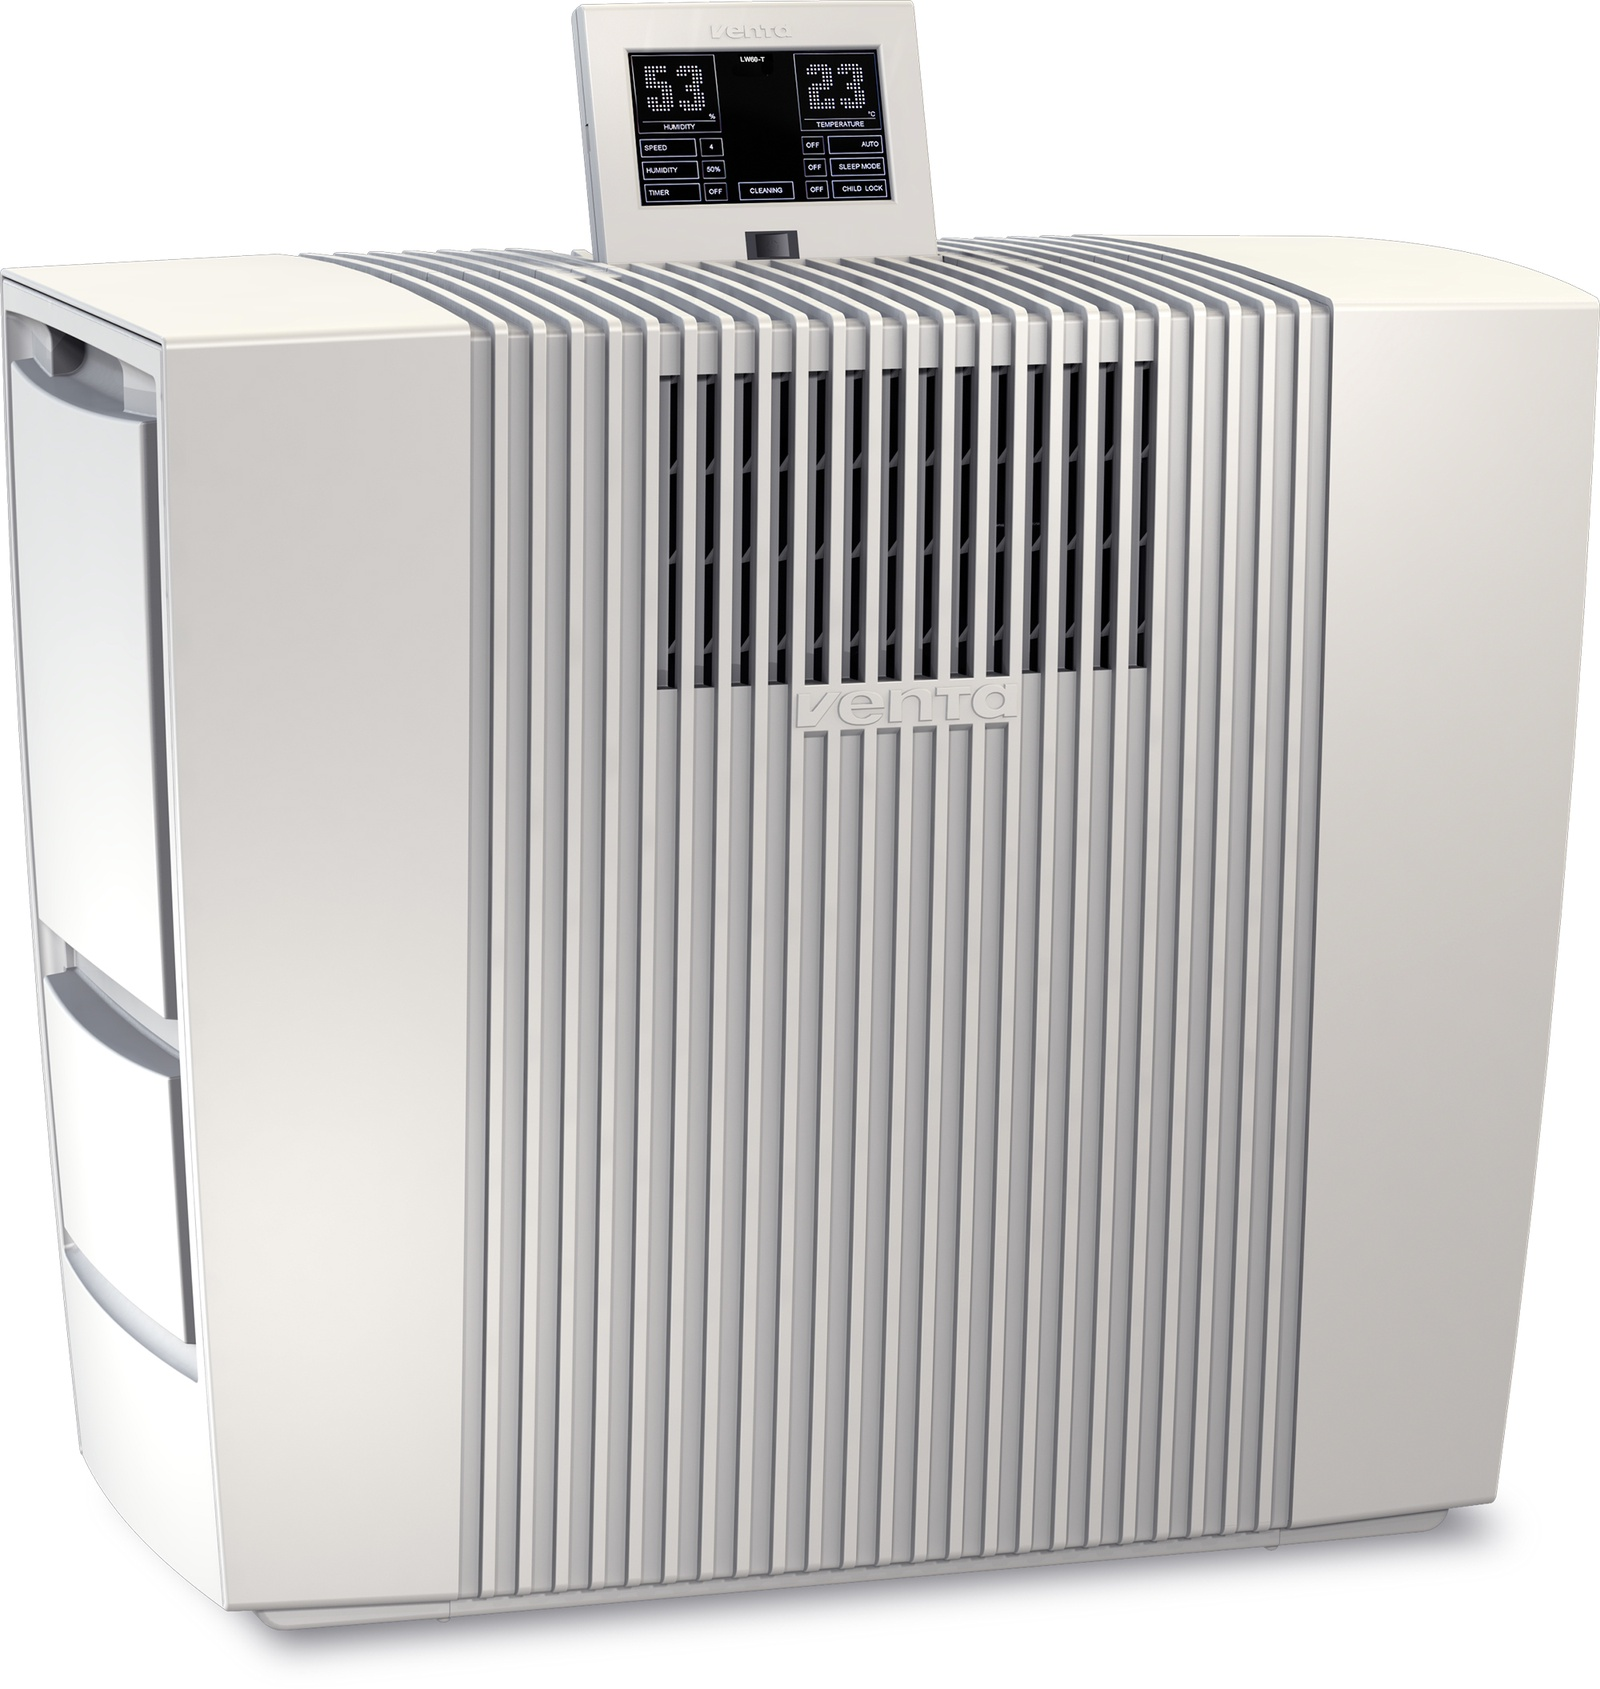 Мойка воздуха Venta Venta, LW60 T weiss цена